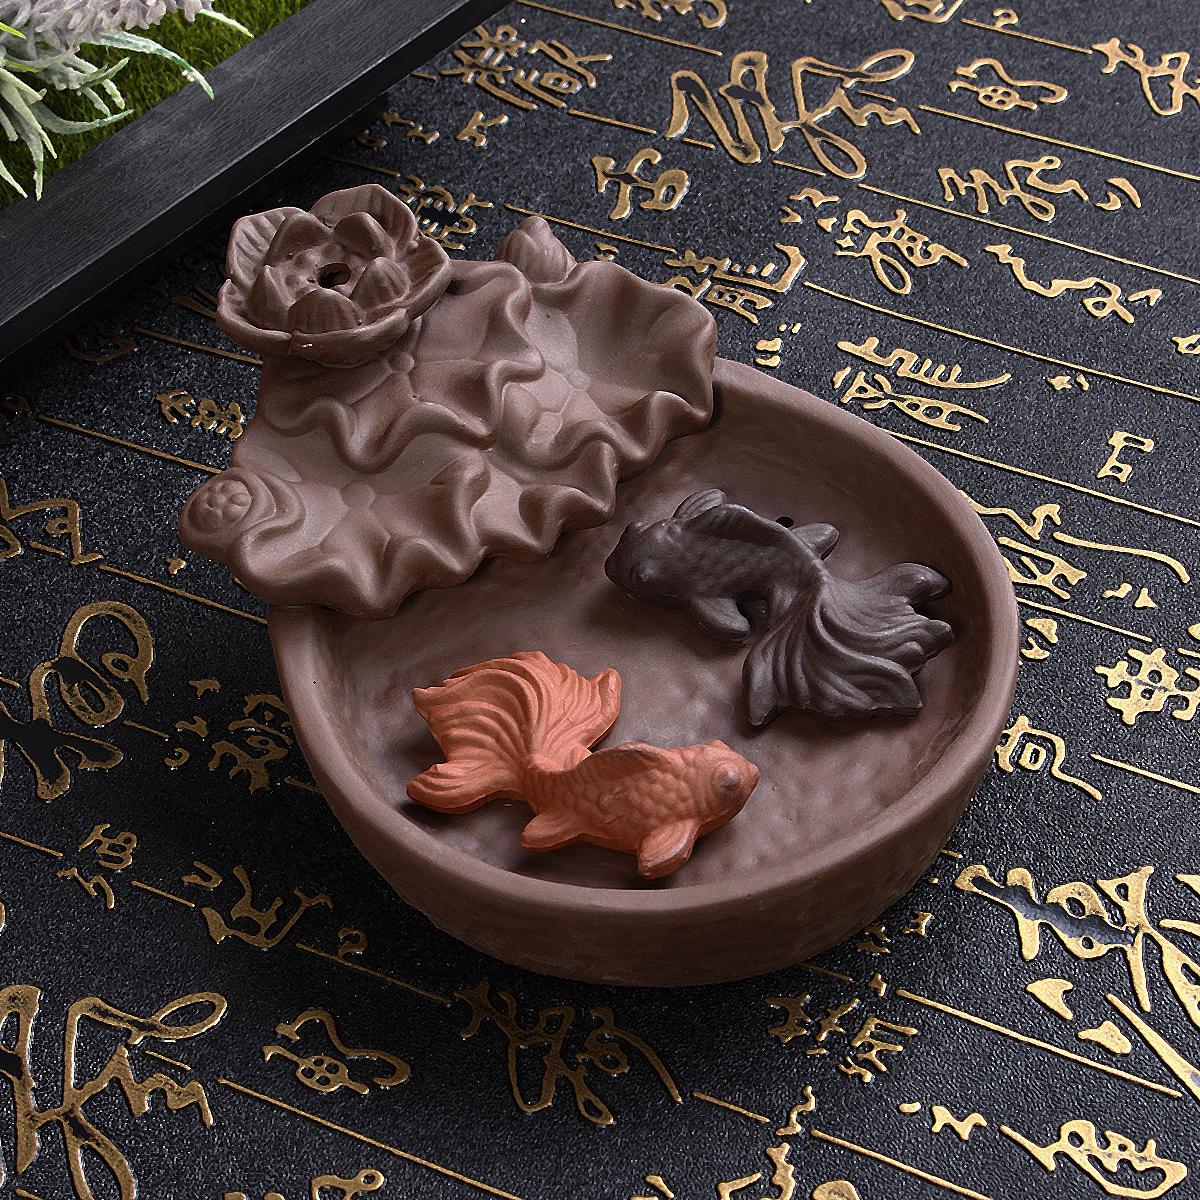 Fish Backflow Incense Burner Censer Stick Holder Decor Gift Zen Buddhist Cones Holder